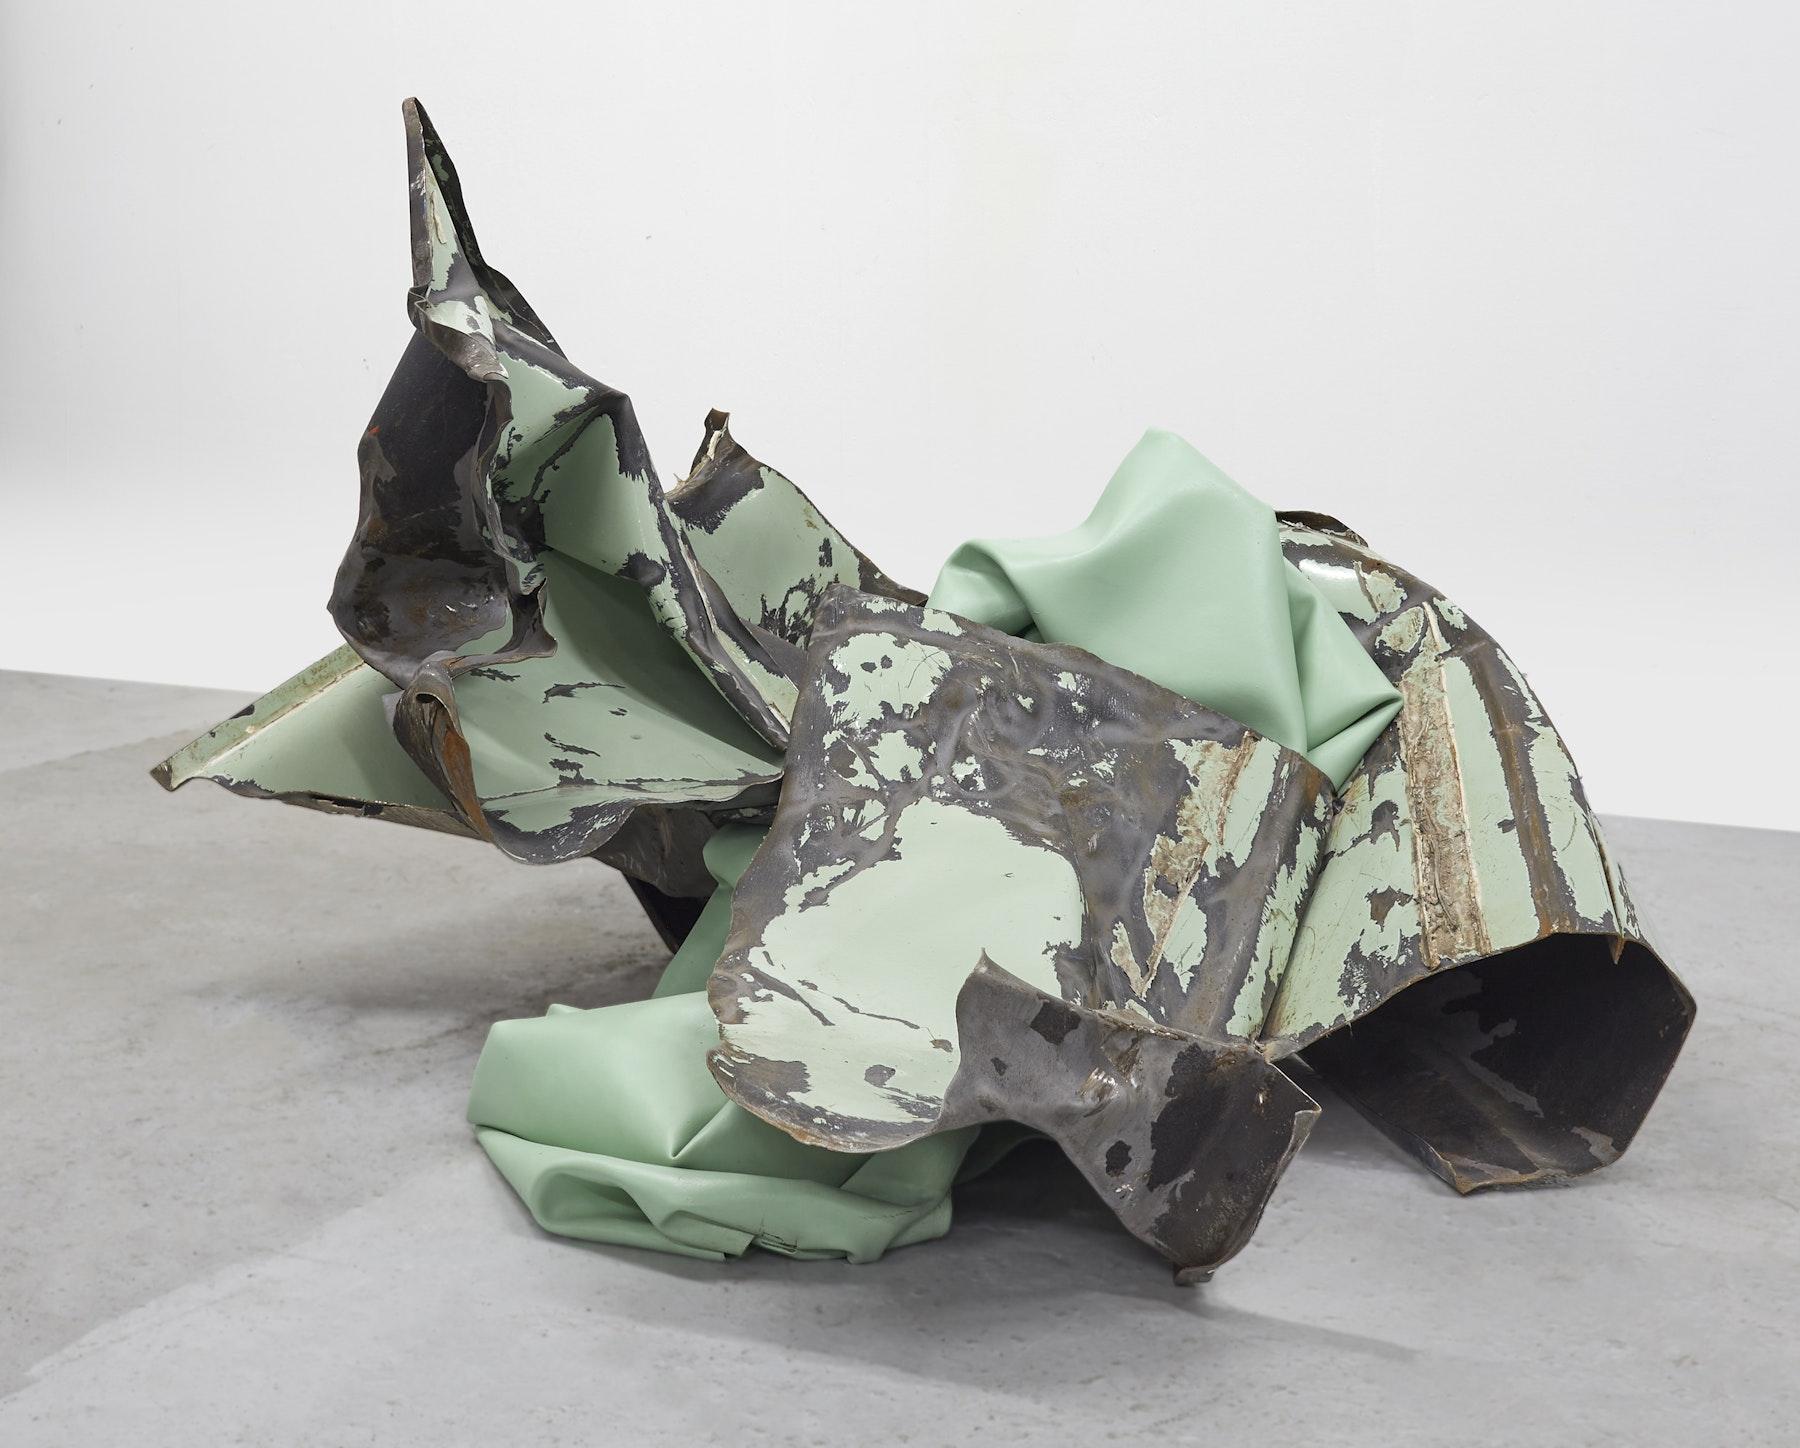 "Kennedy Yanko ""Precipice,"" 2020 Paint skin, metal 31.5 x 43 x 56"" [HxWxD] (80.01 x 109.22 x 142.24 cm) Inventory #YAN1014 Courtesy of the artist and Vielmetter Los Angeles"